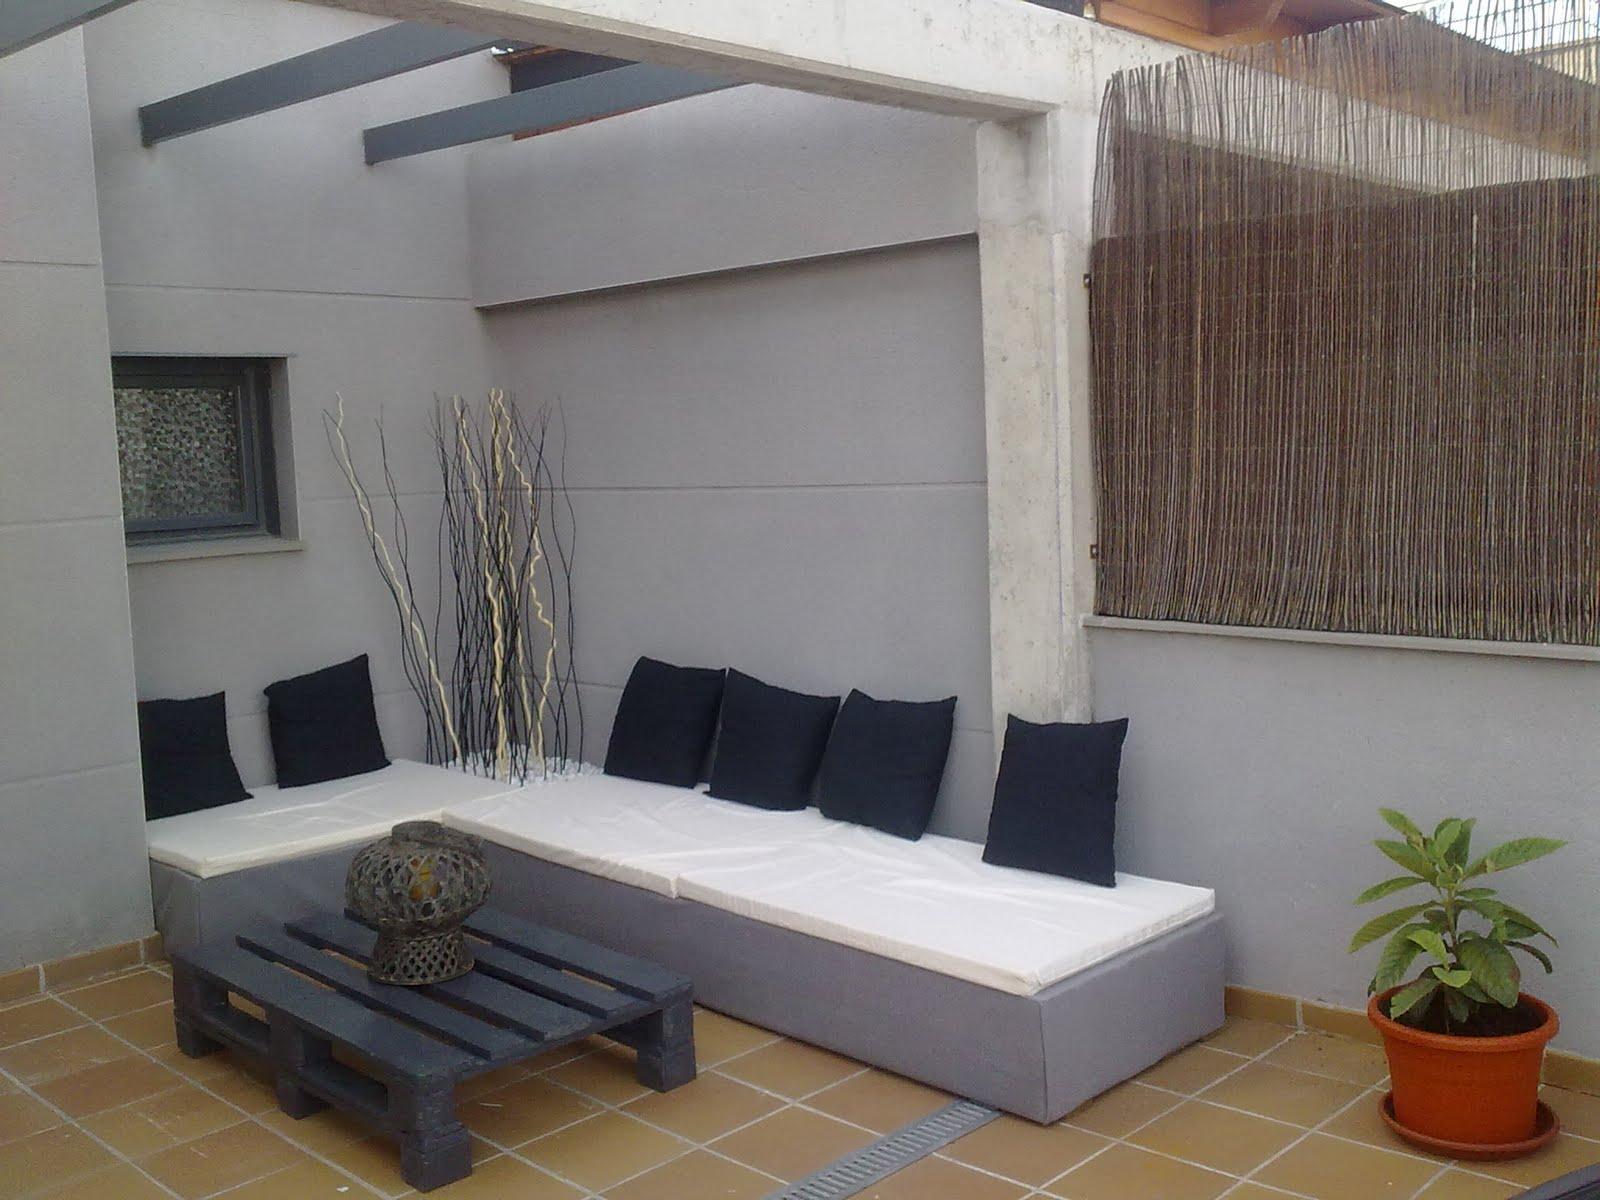 El sofa chill out de palets de david for Colchonetas para sofas de palets